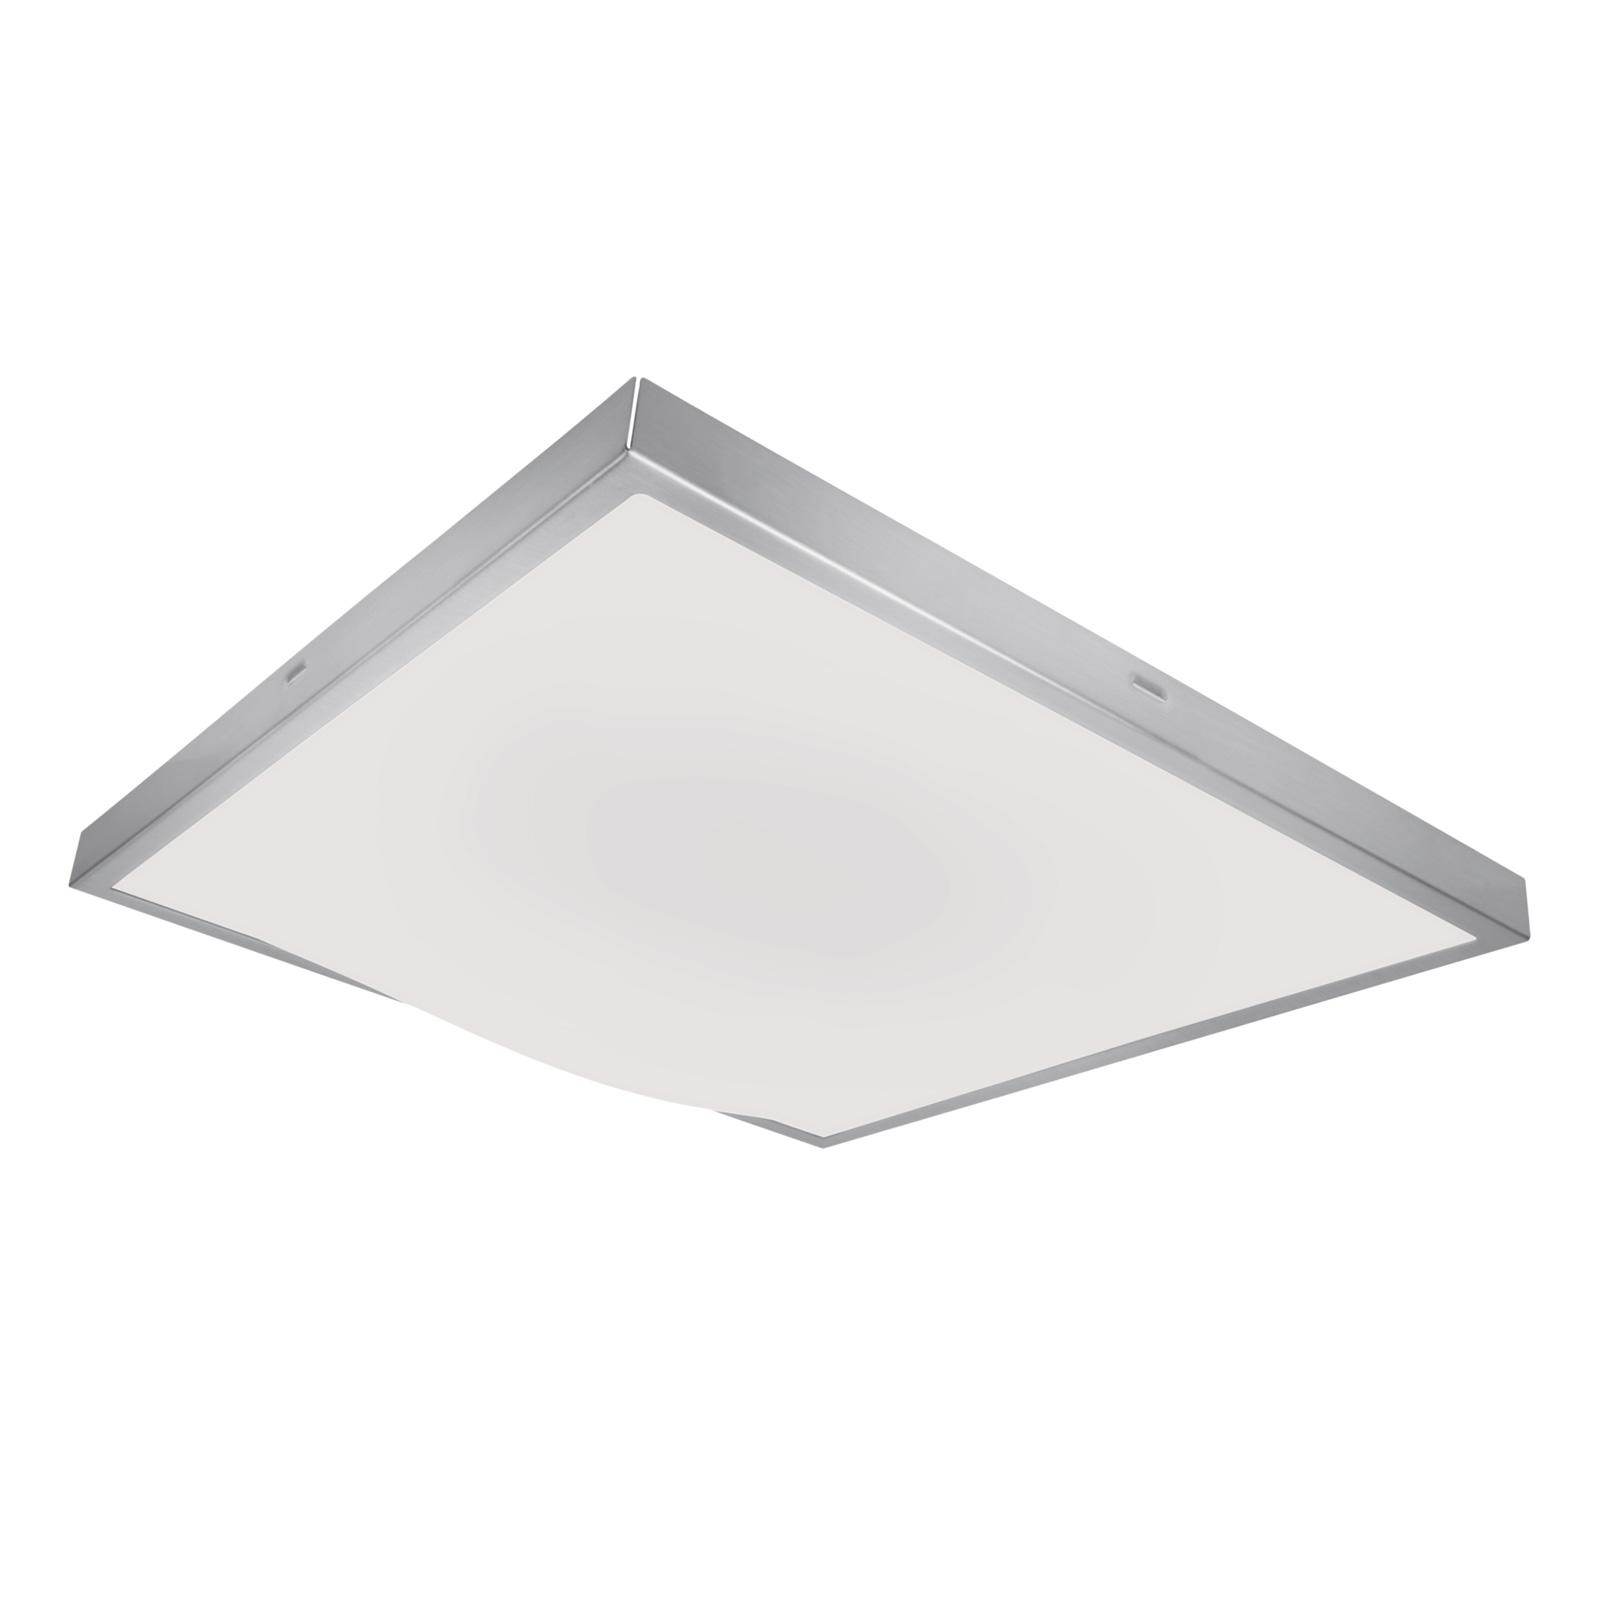 LEDVANCE Lunive Vela lampa sufitowa 40,5cm 3000K